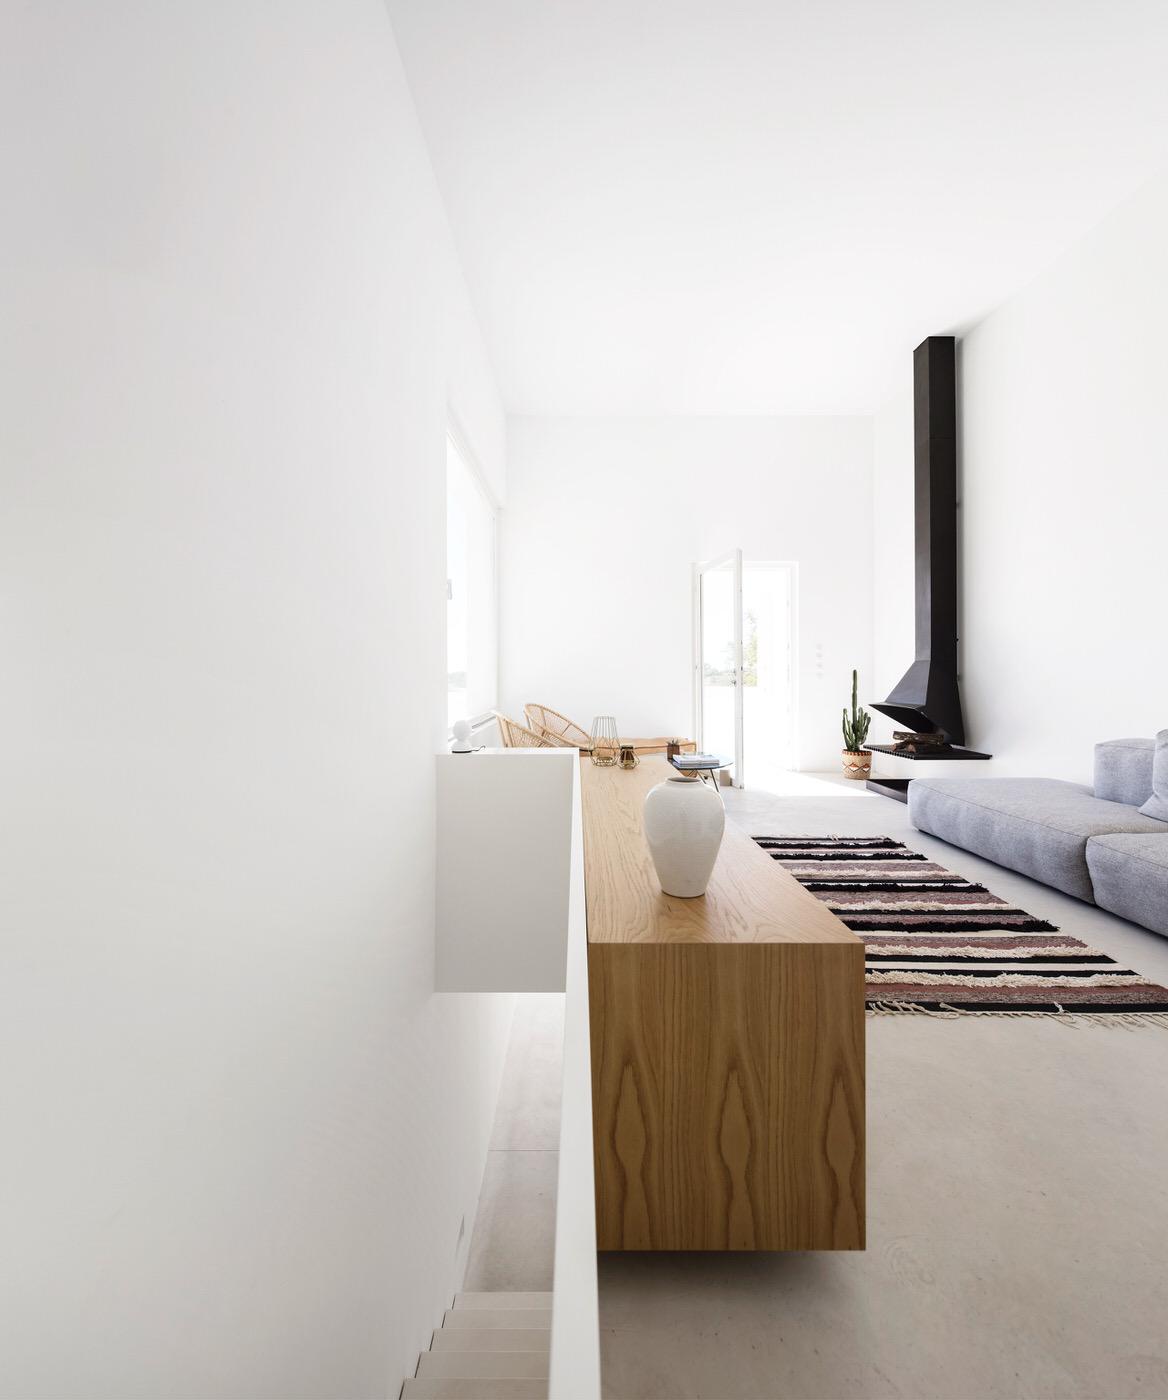 Zalig-Algarve-Casa-Luum-109-1_1